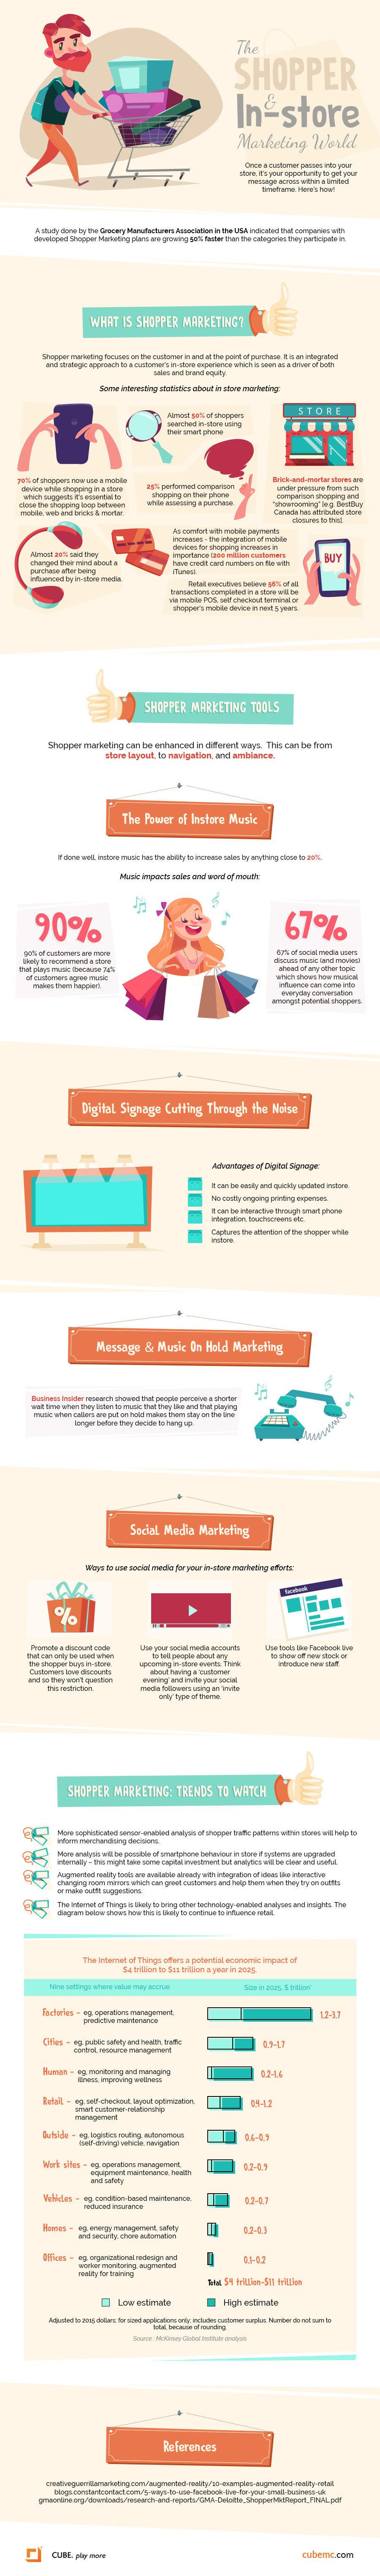 Shopper marketing infographic